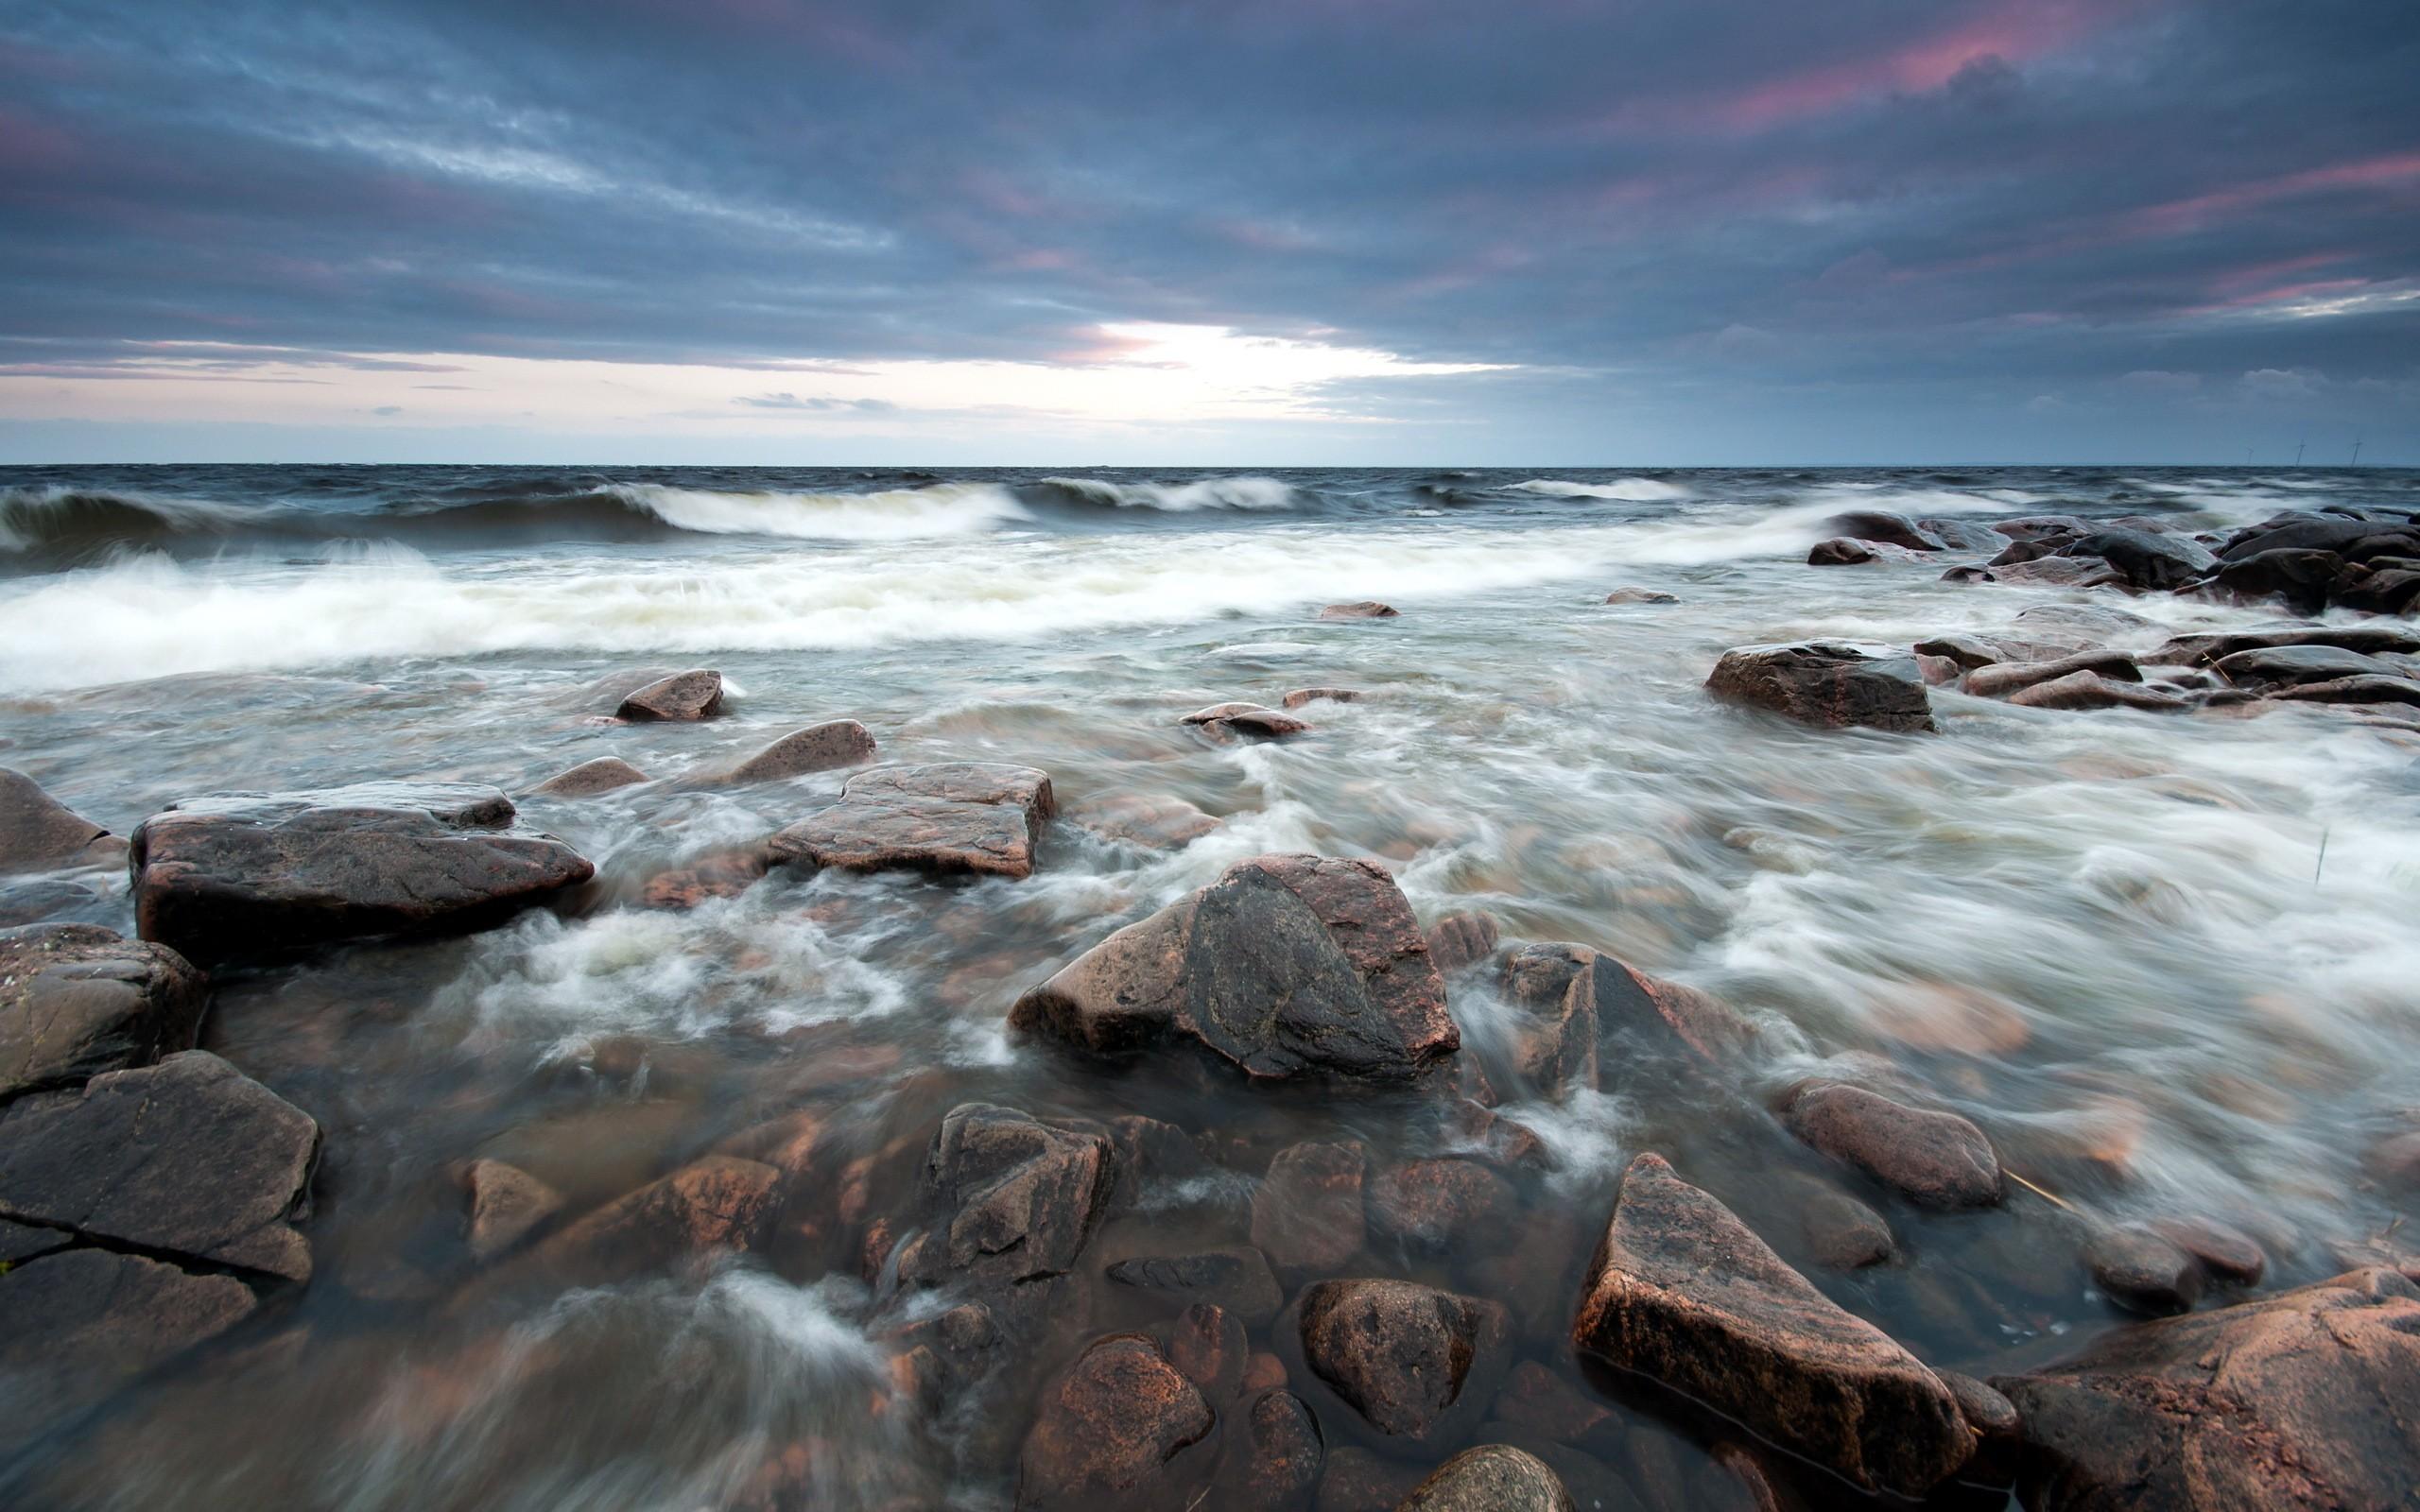 Stony Beach Waves wallpaper 2560x1600 31886 2560x1600